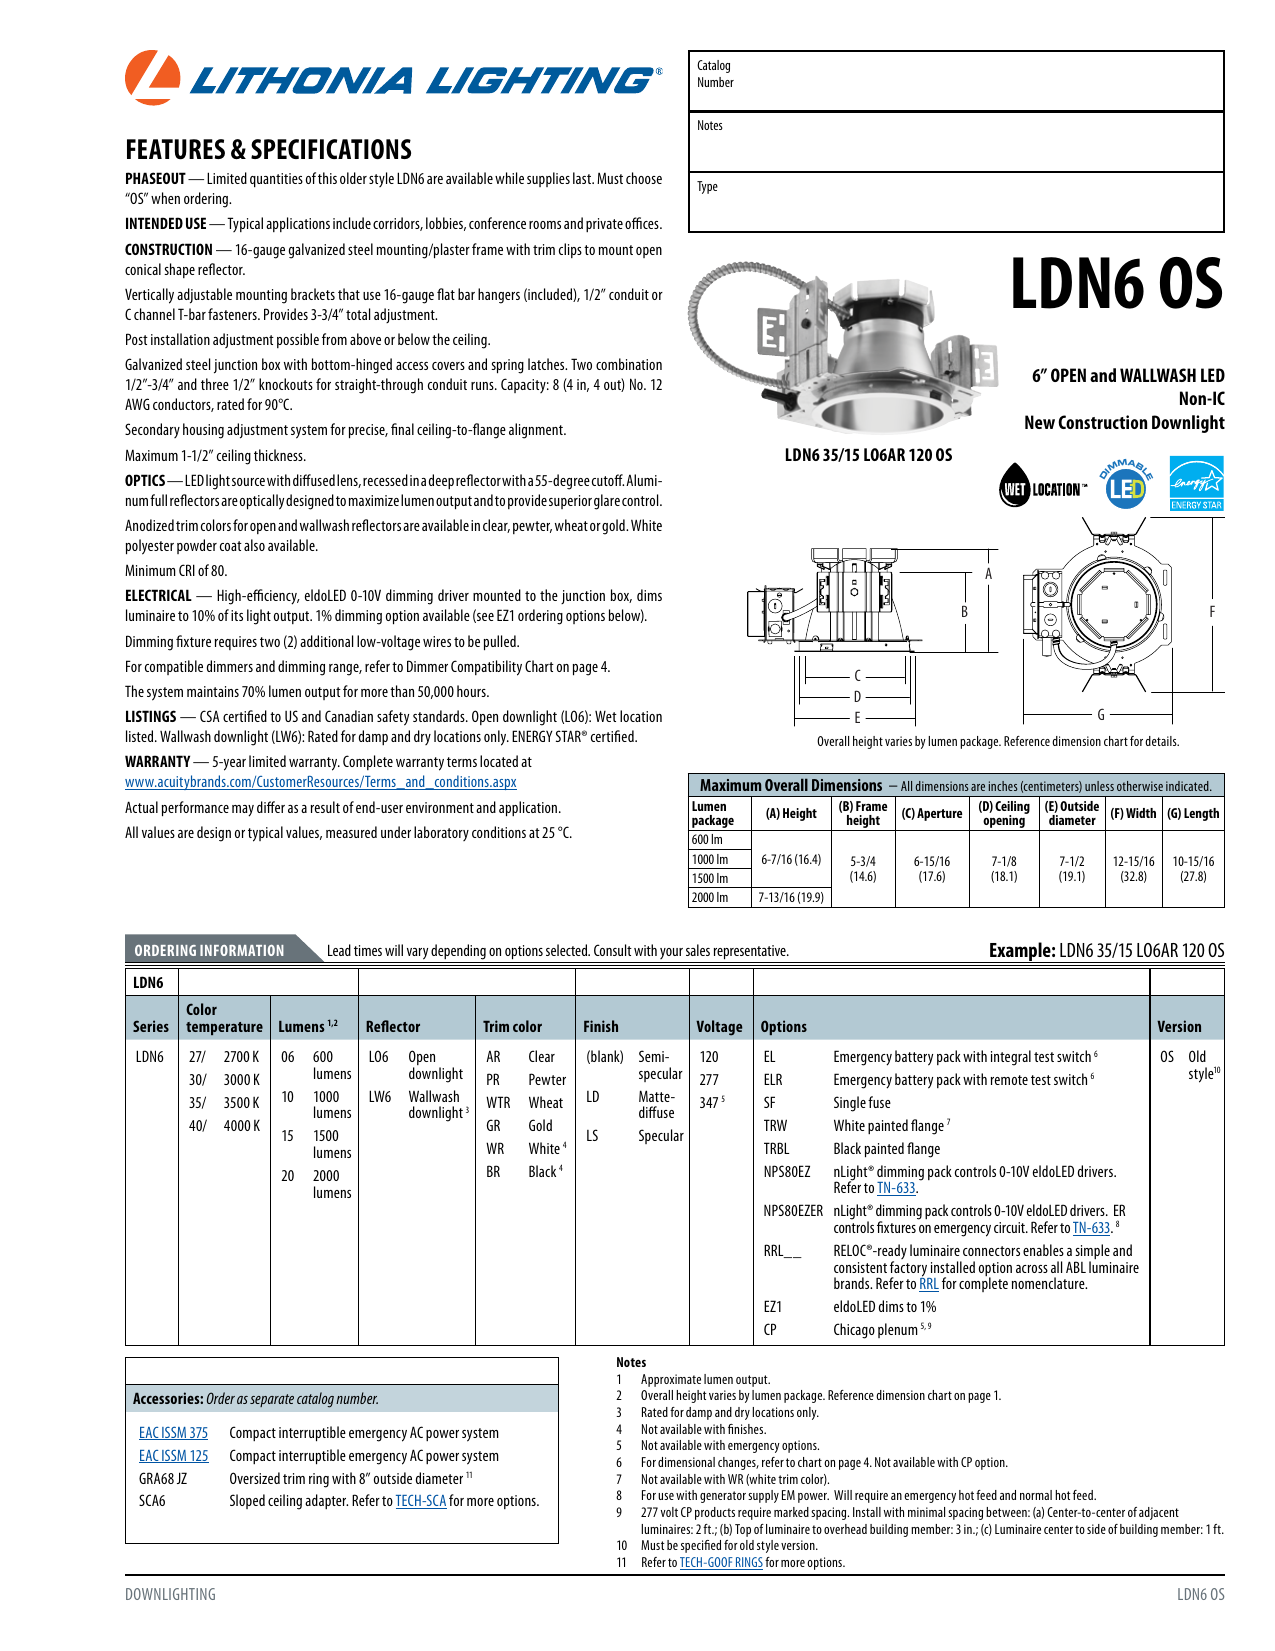 Lithonia ldn6 wiring diagram lighting diy wiring diagrams ldn6 os acuity brands rh studylib net outdoor lighting wiring diagram lithonia emergency light wiring diagram cheapraybanclubmaster Gallery